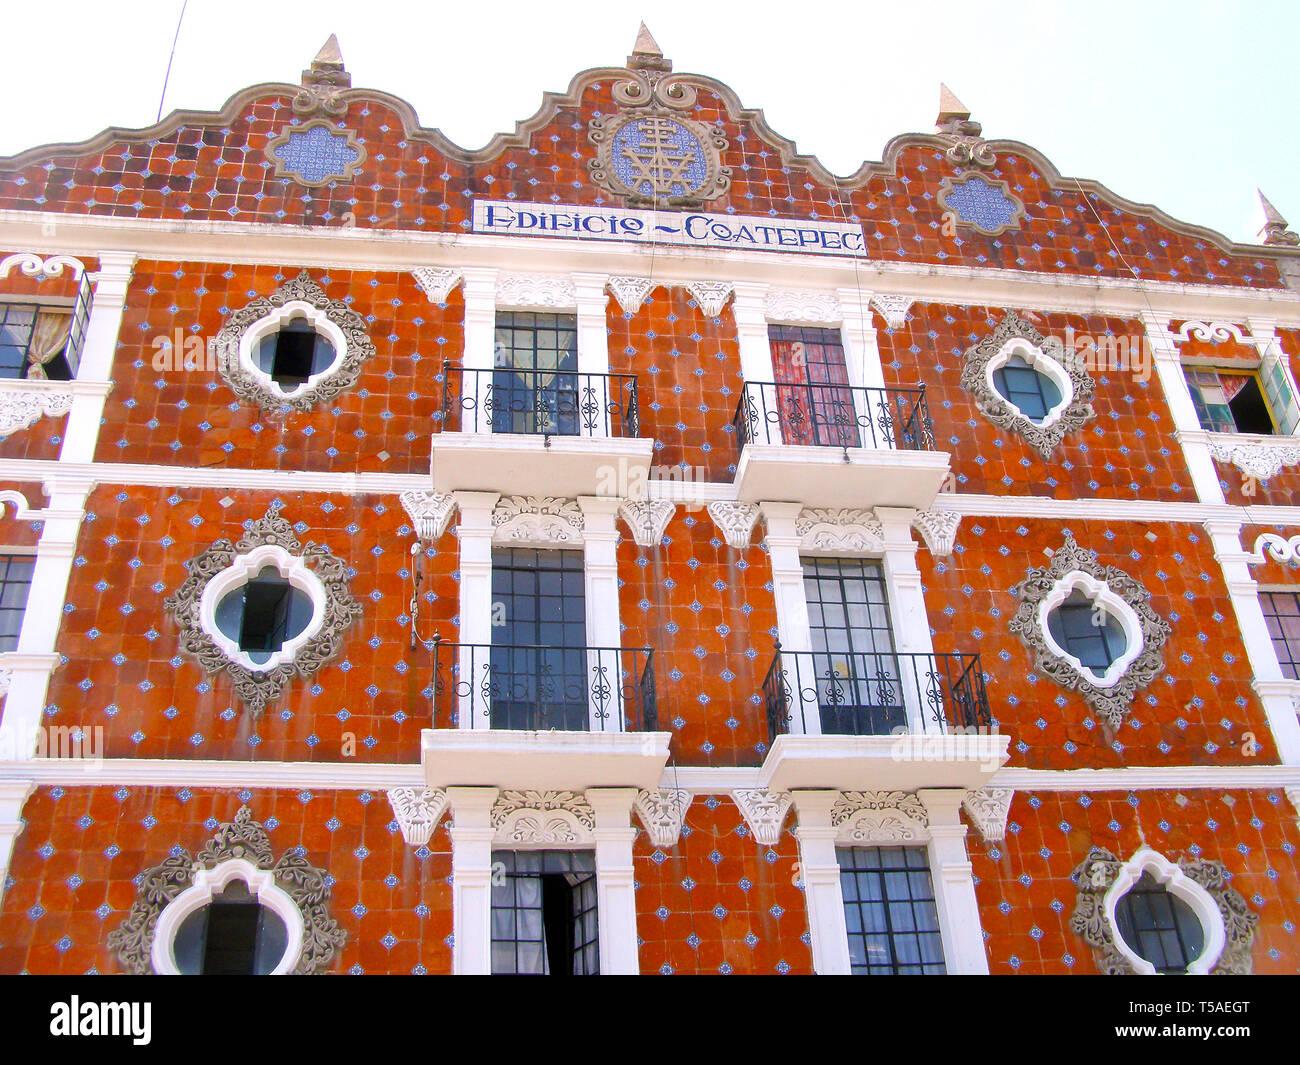 Merida Mexico Architecture Colorful Stock Photos & Merida